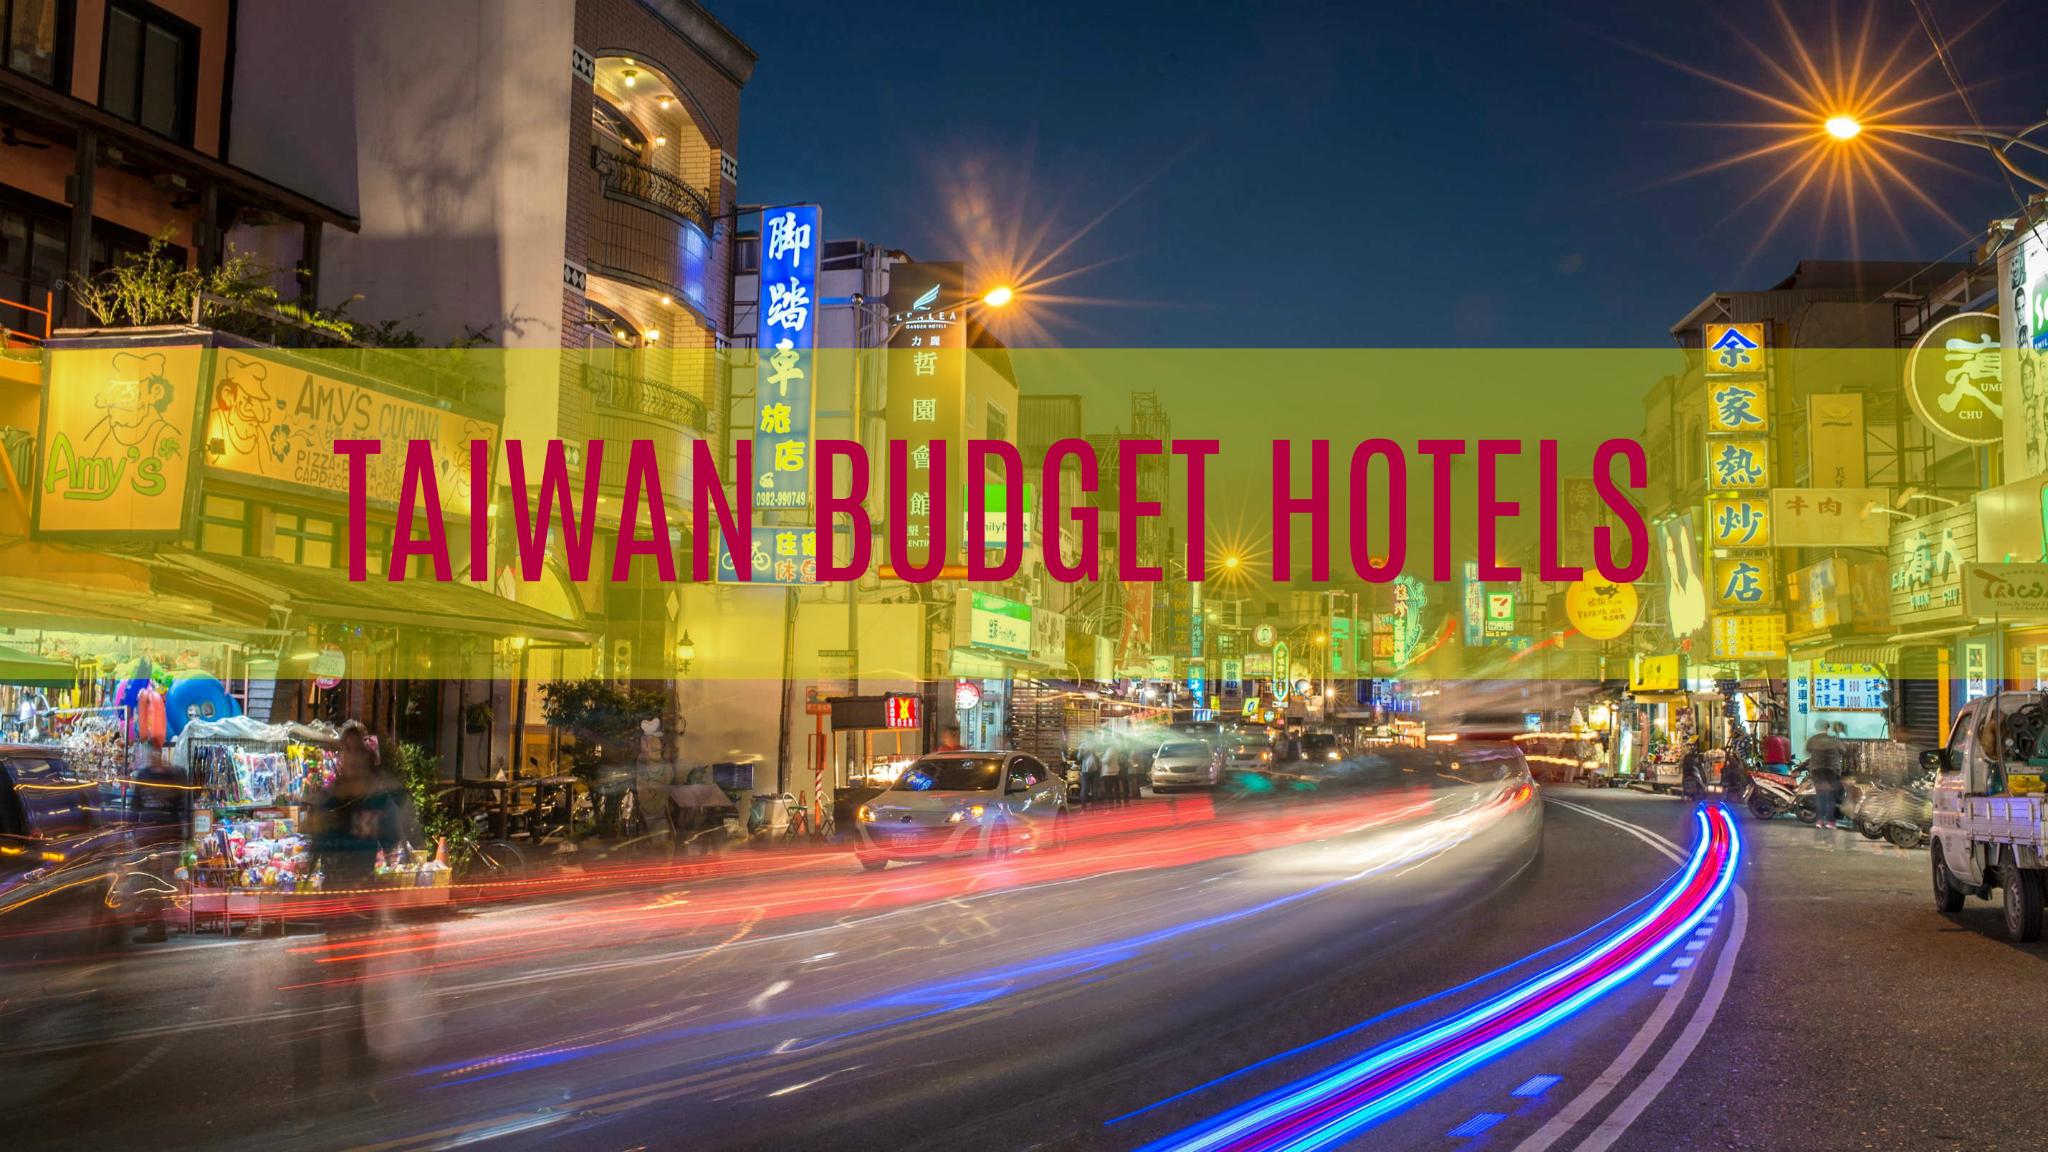 TAIWAN BUDGET HOTELS 2017